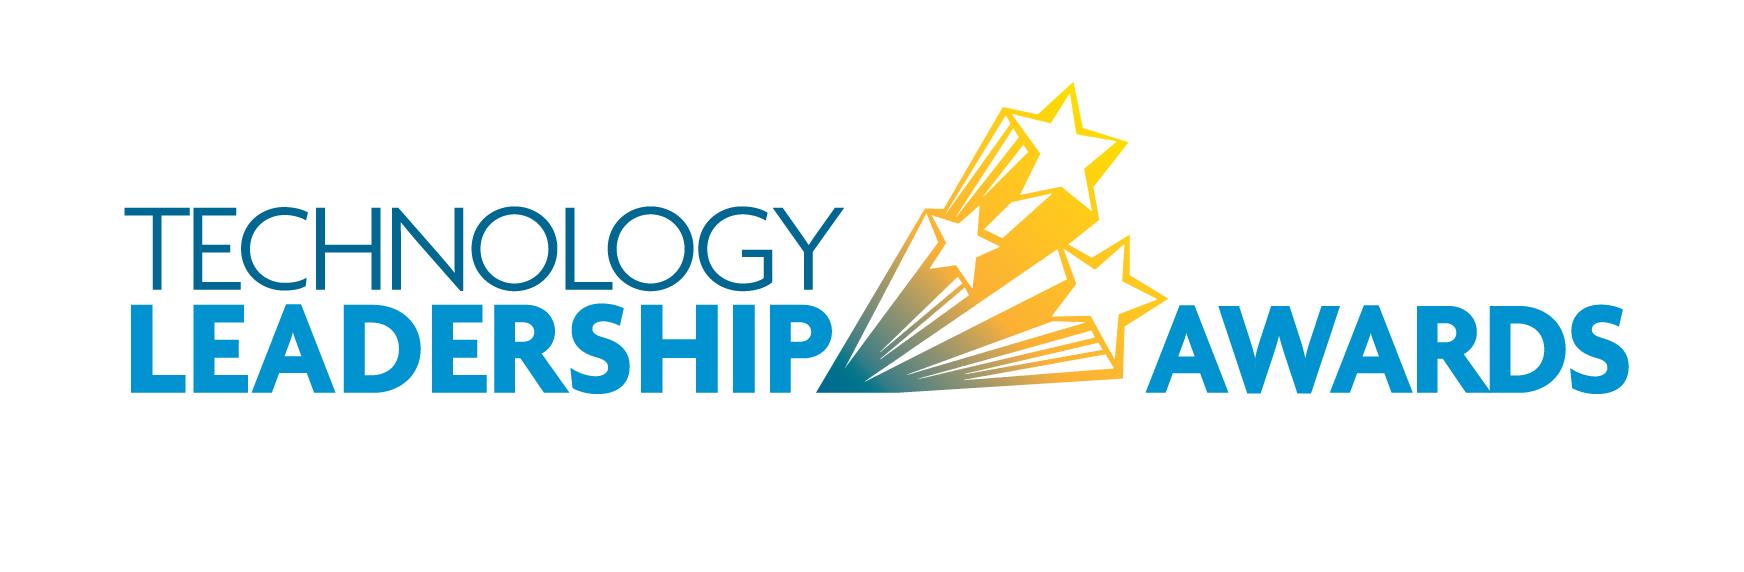 Momentum Company Of The Year, Technology Leadership Awards